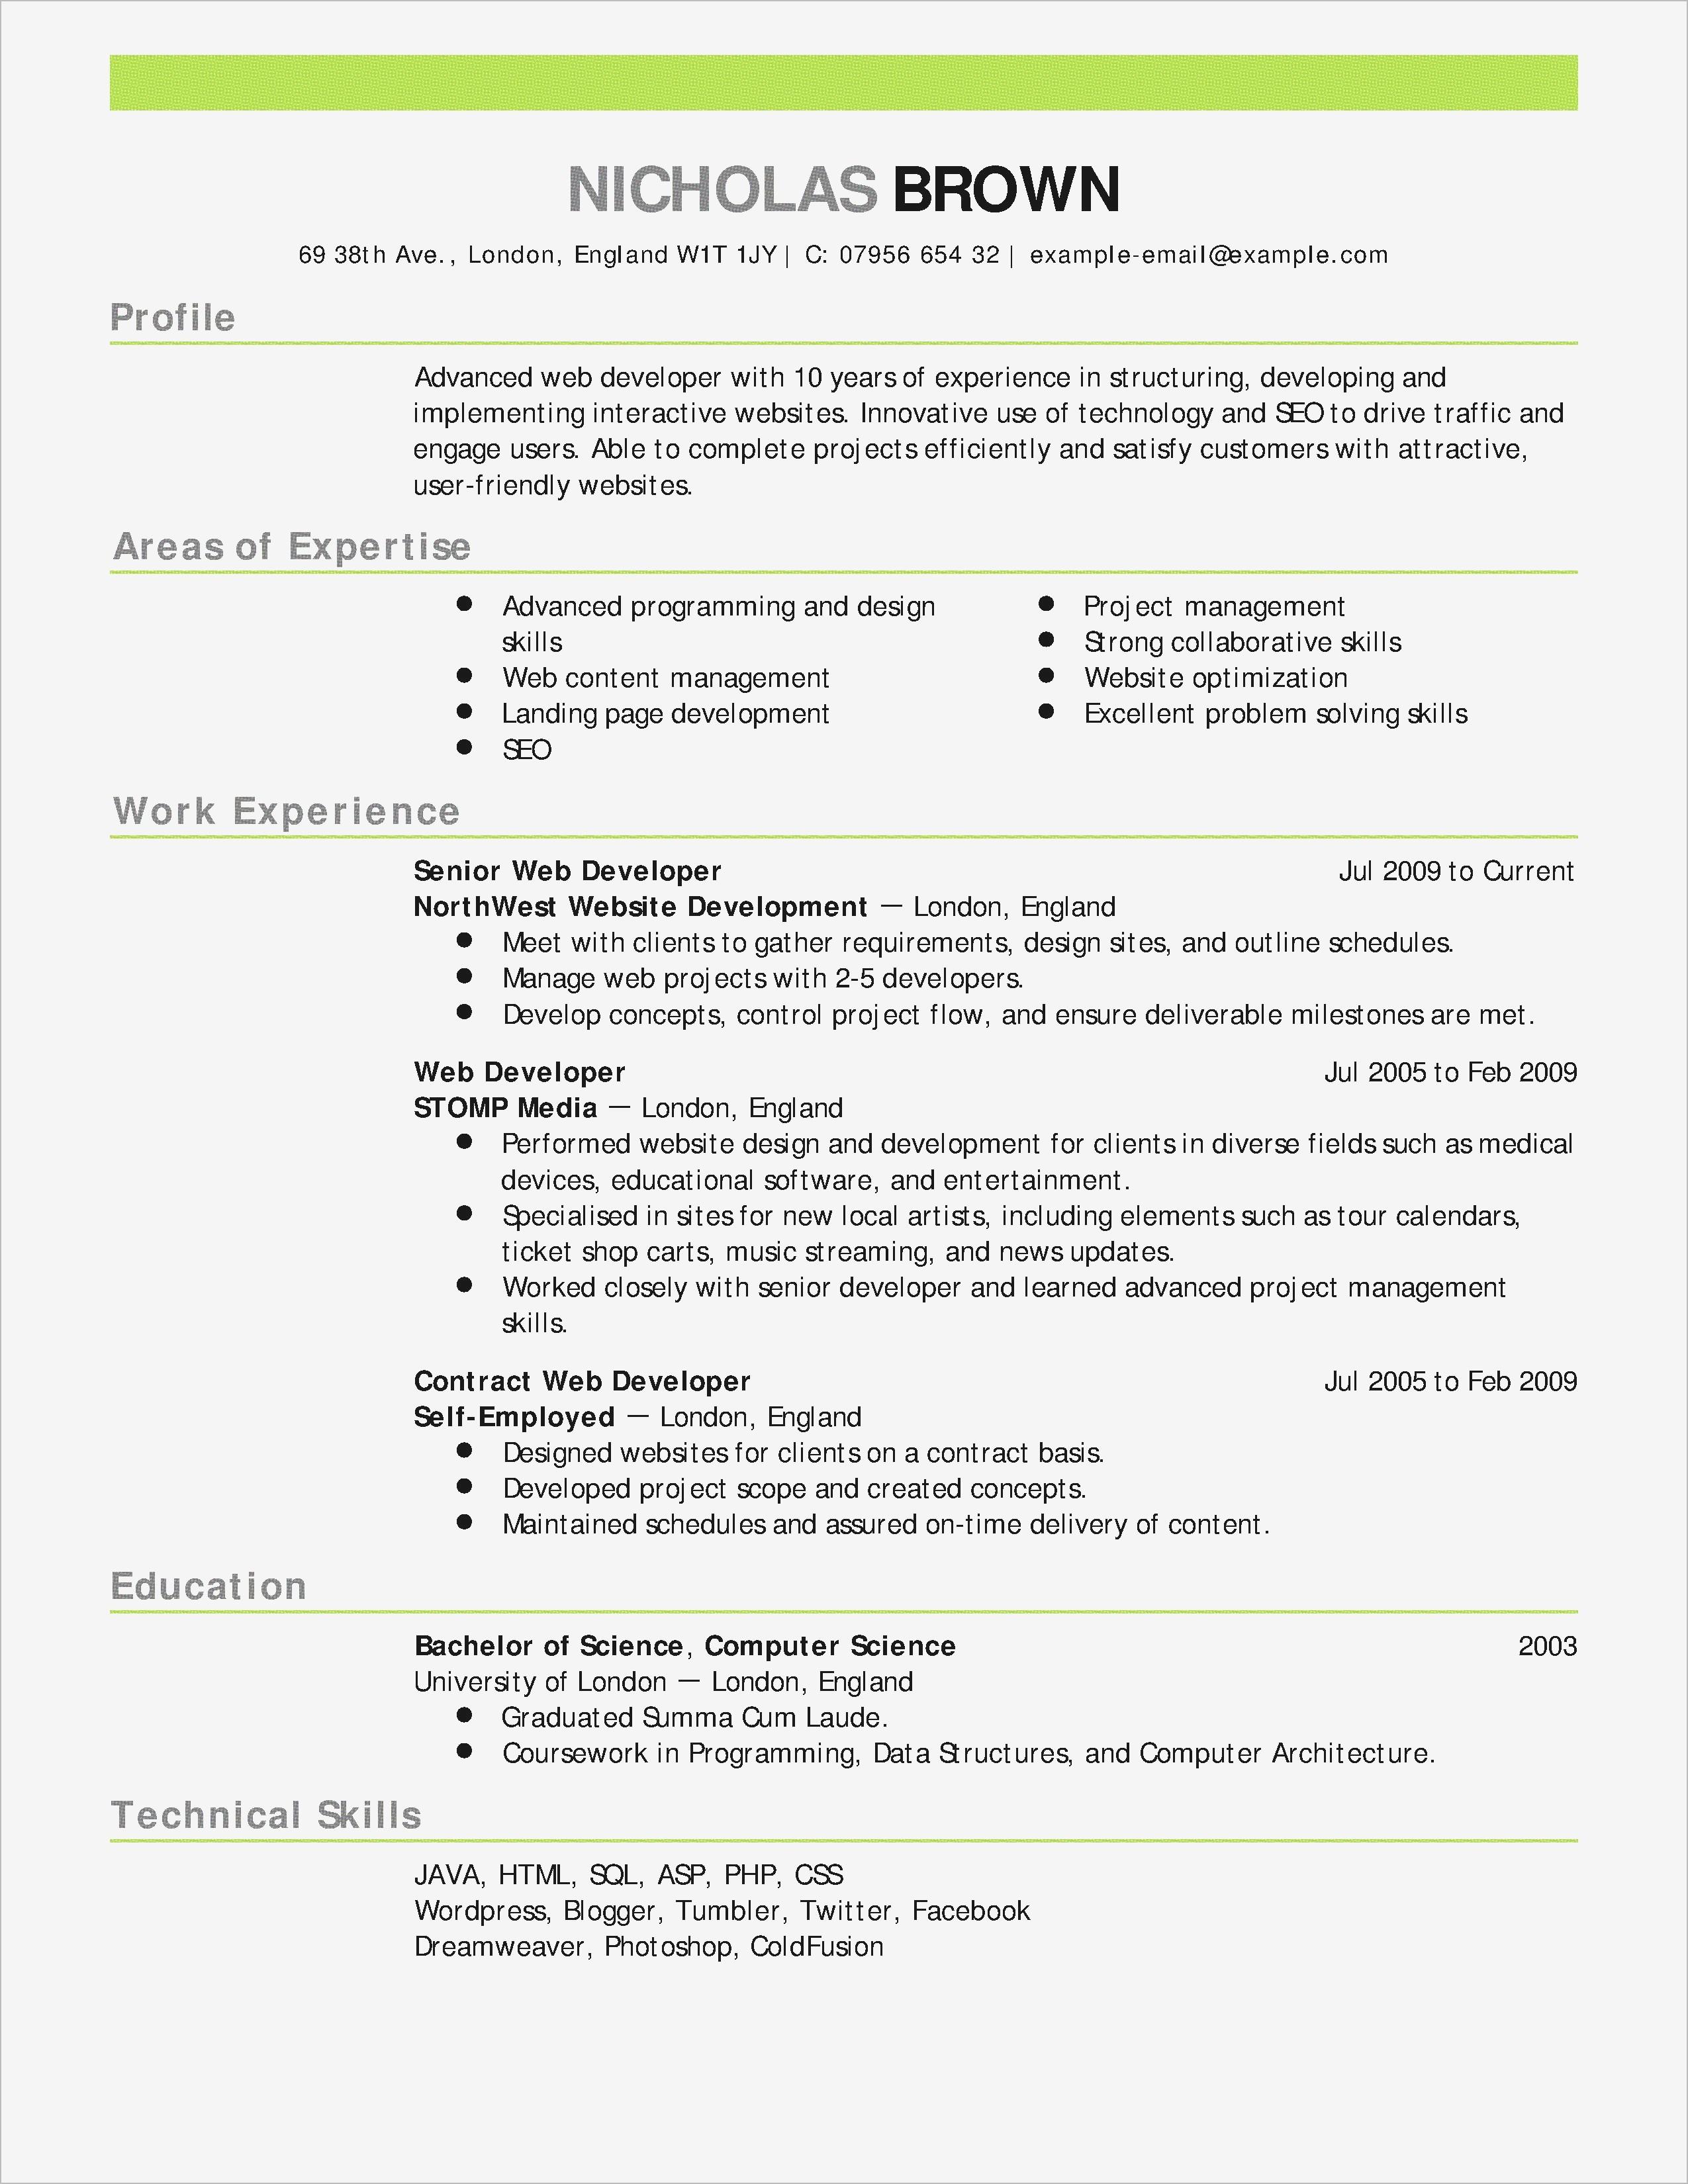 Severance Letter Template - Severance Letter Template